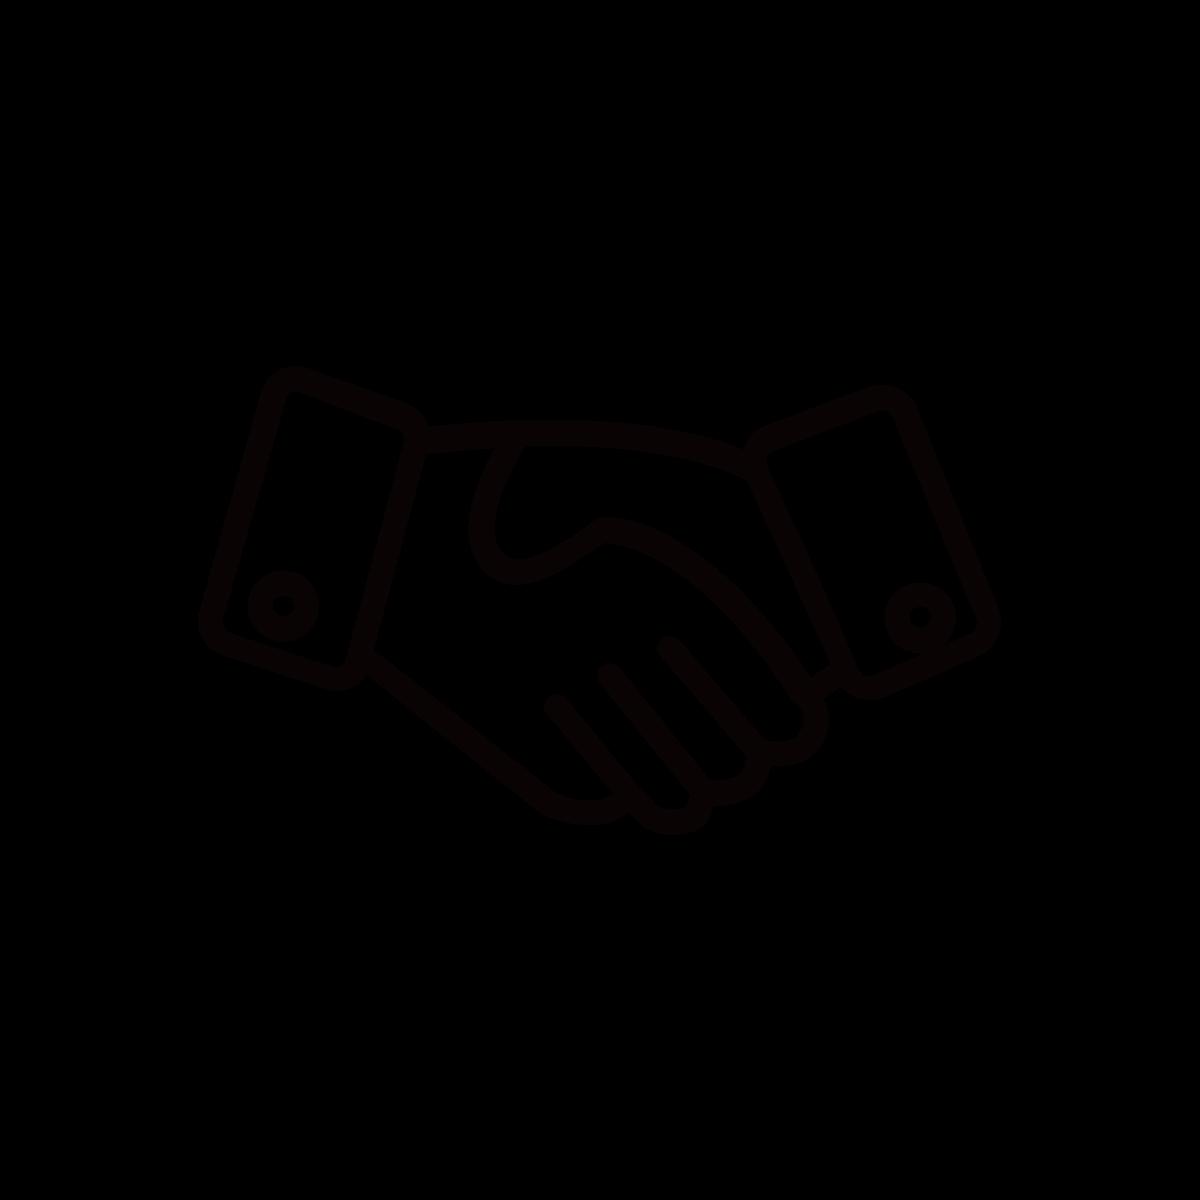 noun_agreement_2131101